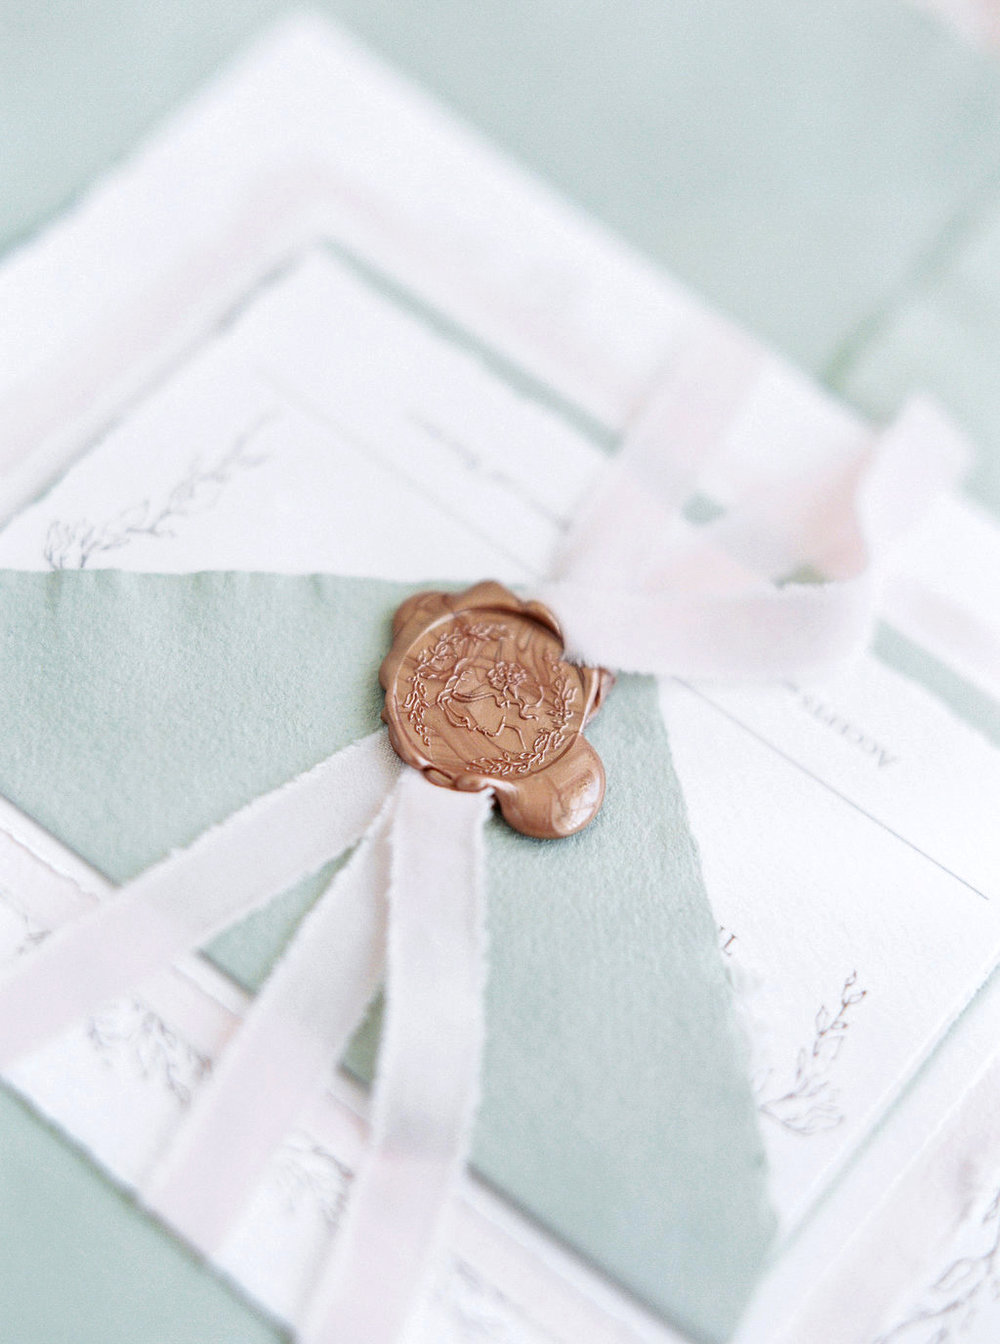 Custom Wax Seals for Wedding Invitations | Wax Seals & Artisaire ...